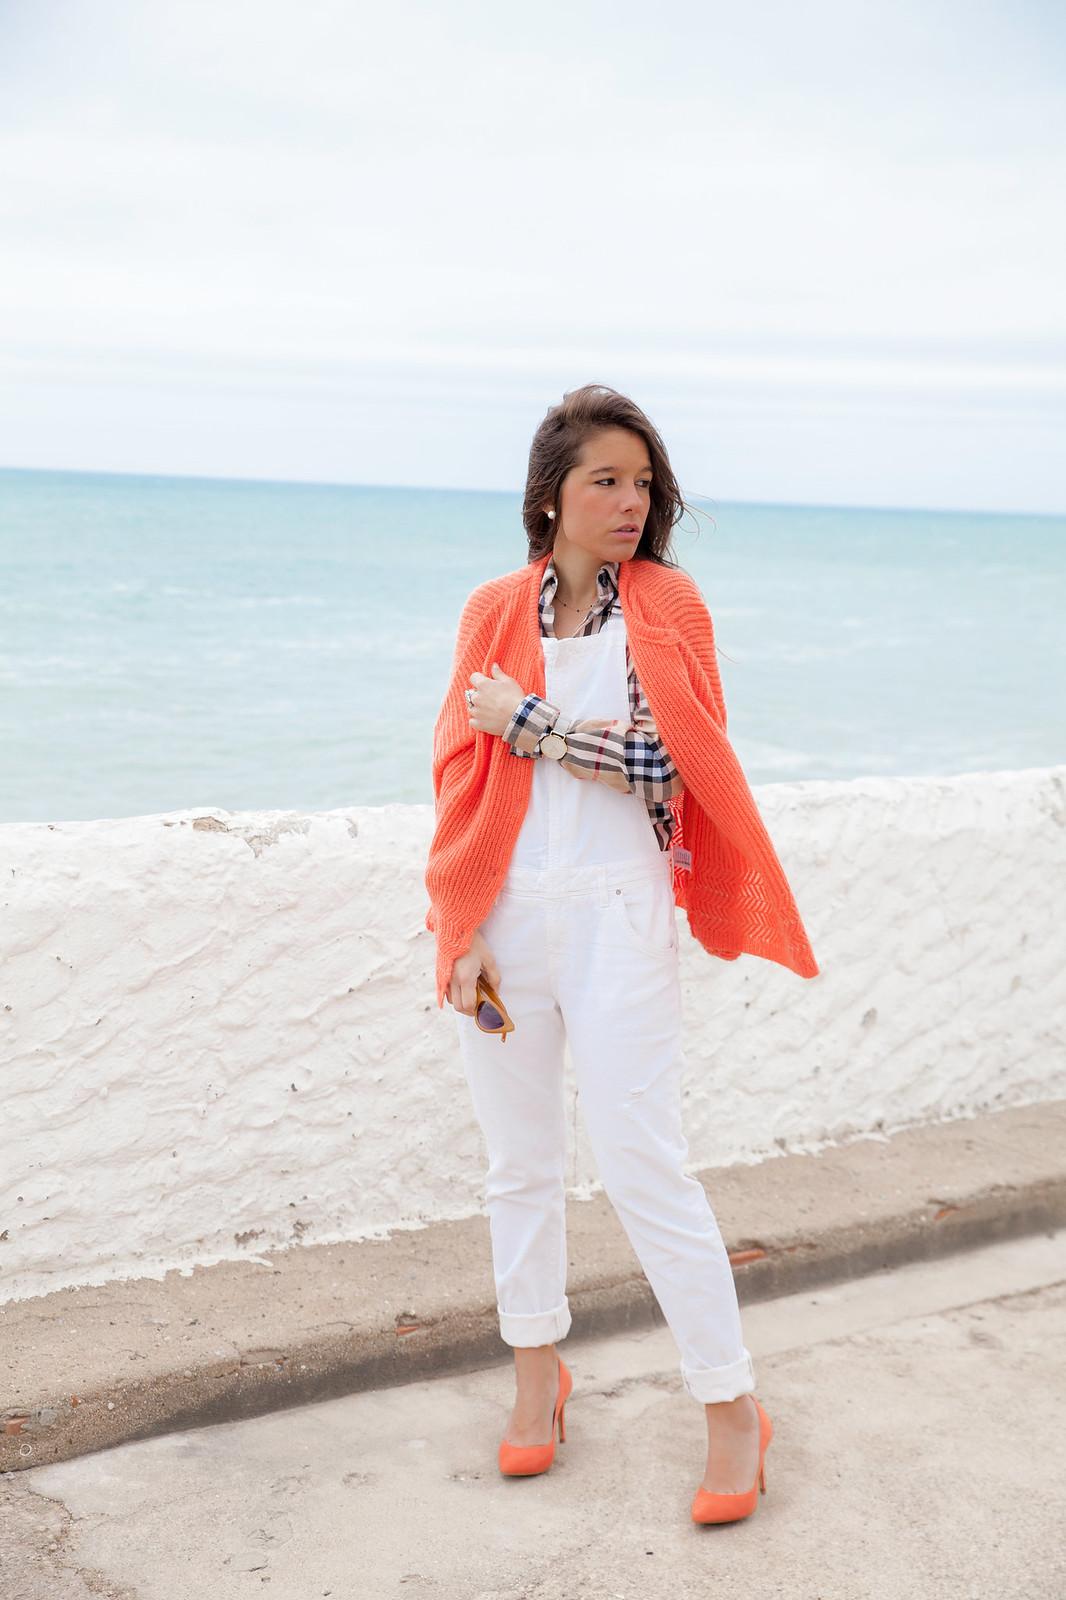 04_Burberry_Outfit_White_overall_Combinar_peto_con_tacones_mas34_theguestgirl_influencer_barcelona